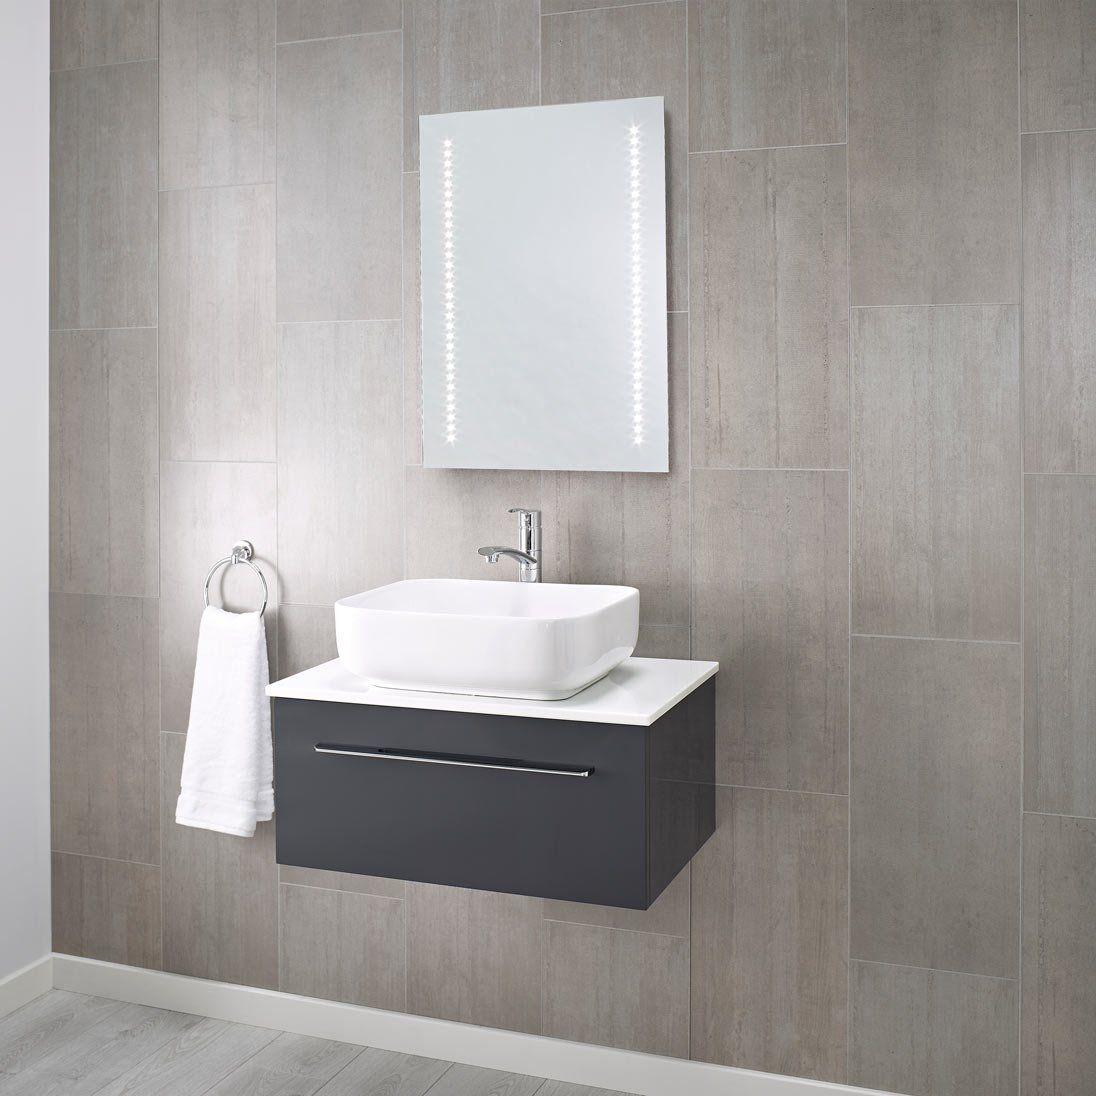 500 X 700 Mm Pebble Grey Tannon Led Illuminated Bathroom Mirror With Infra Red Sensor Grey Bathroom Mirrors Illuminated Bathroom Cabinets Mirror Cabinets